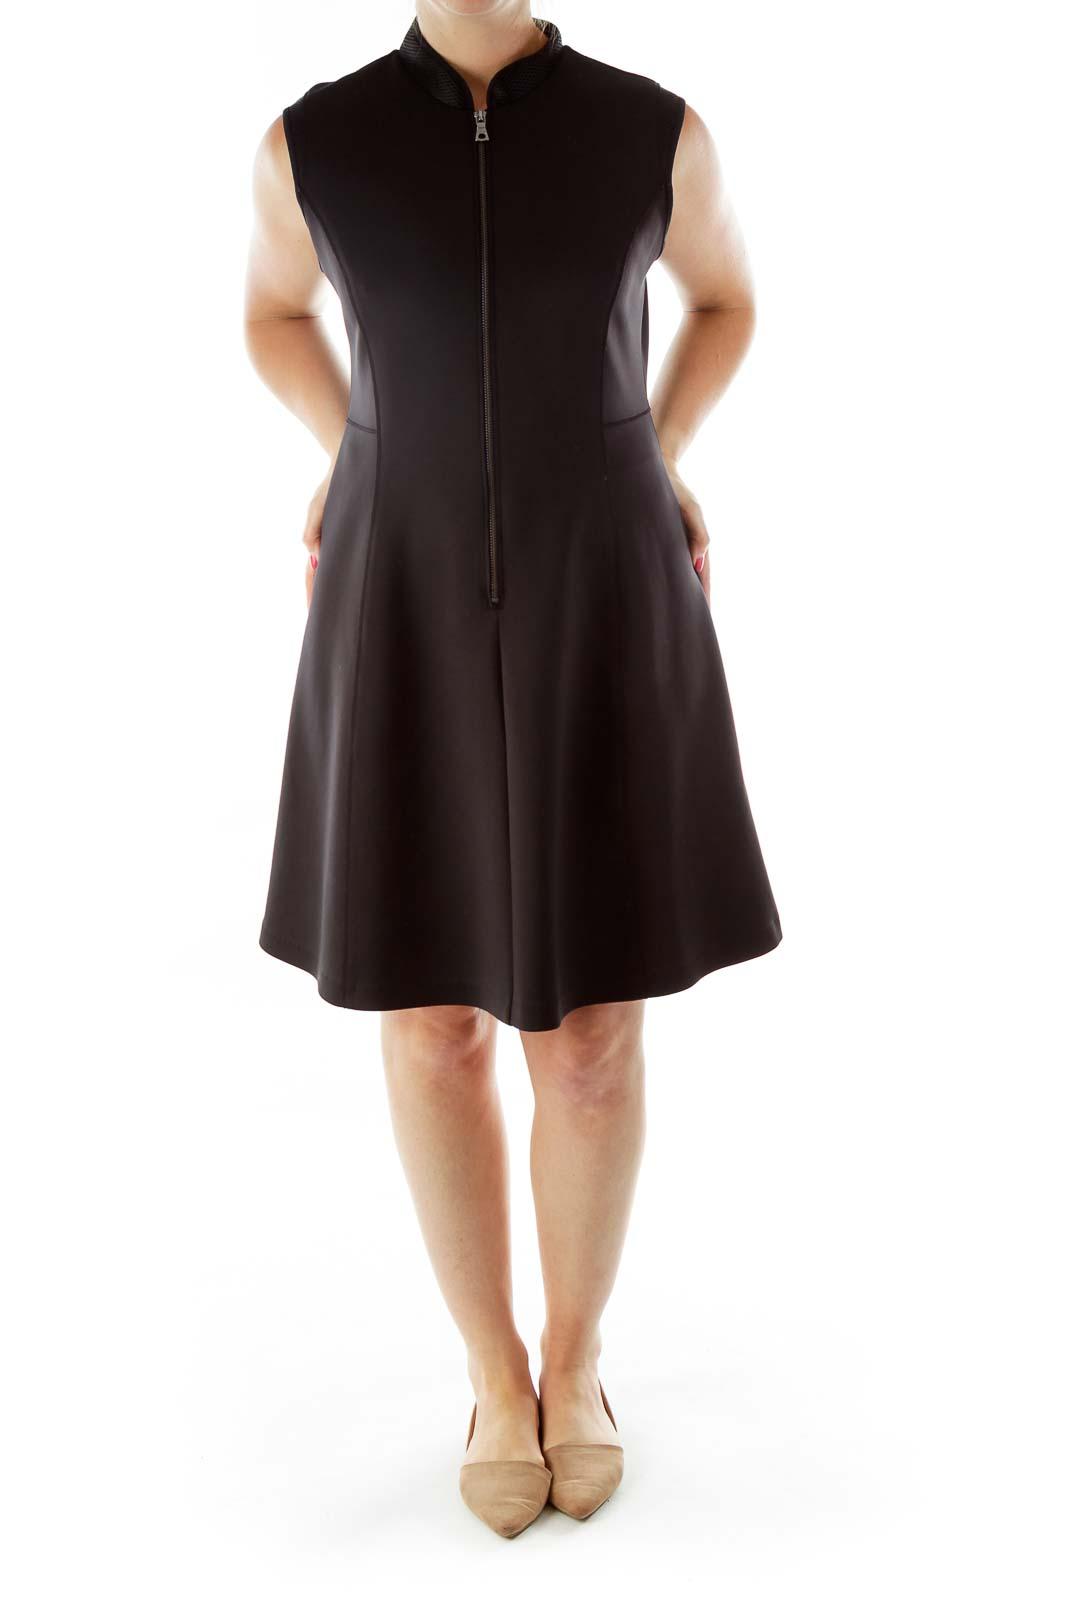 Black Collared Mesh Cocktail Dress